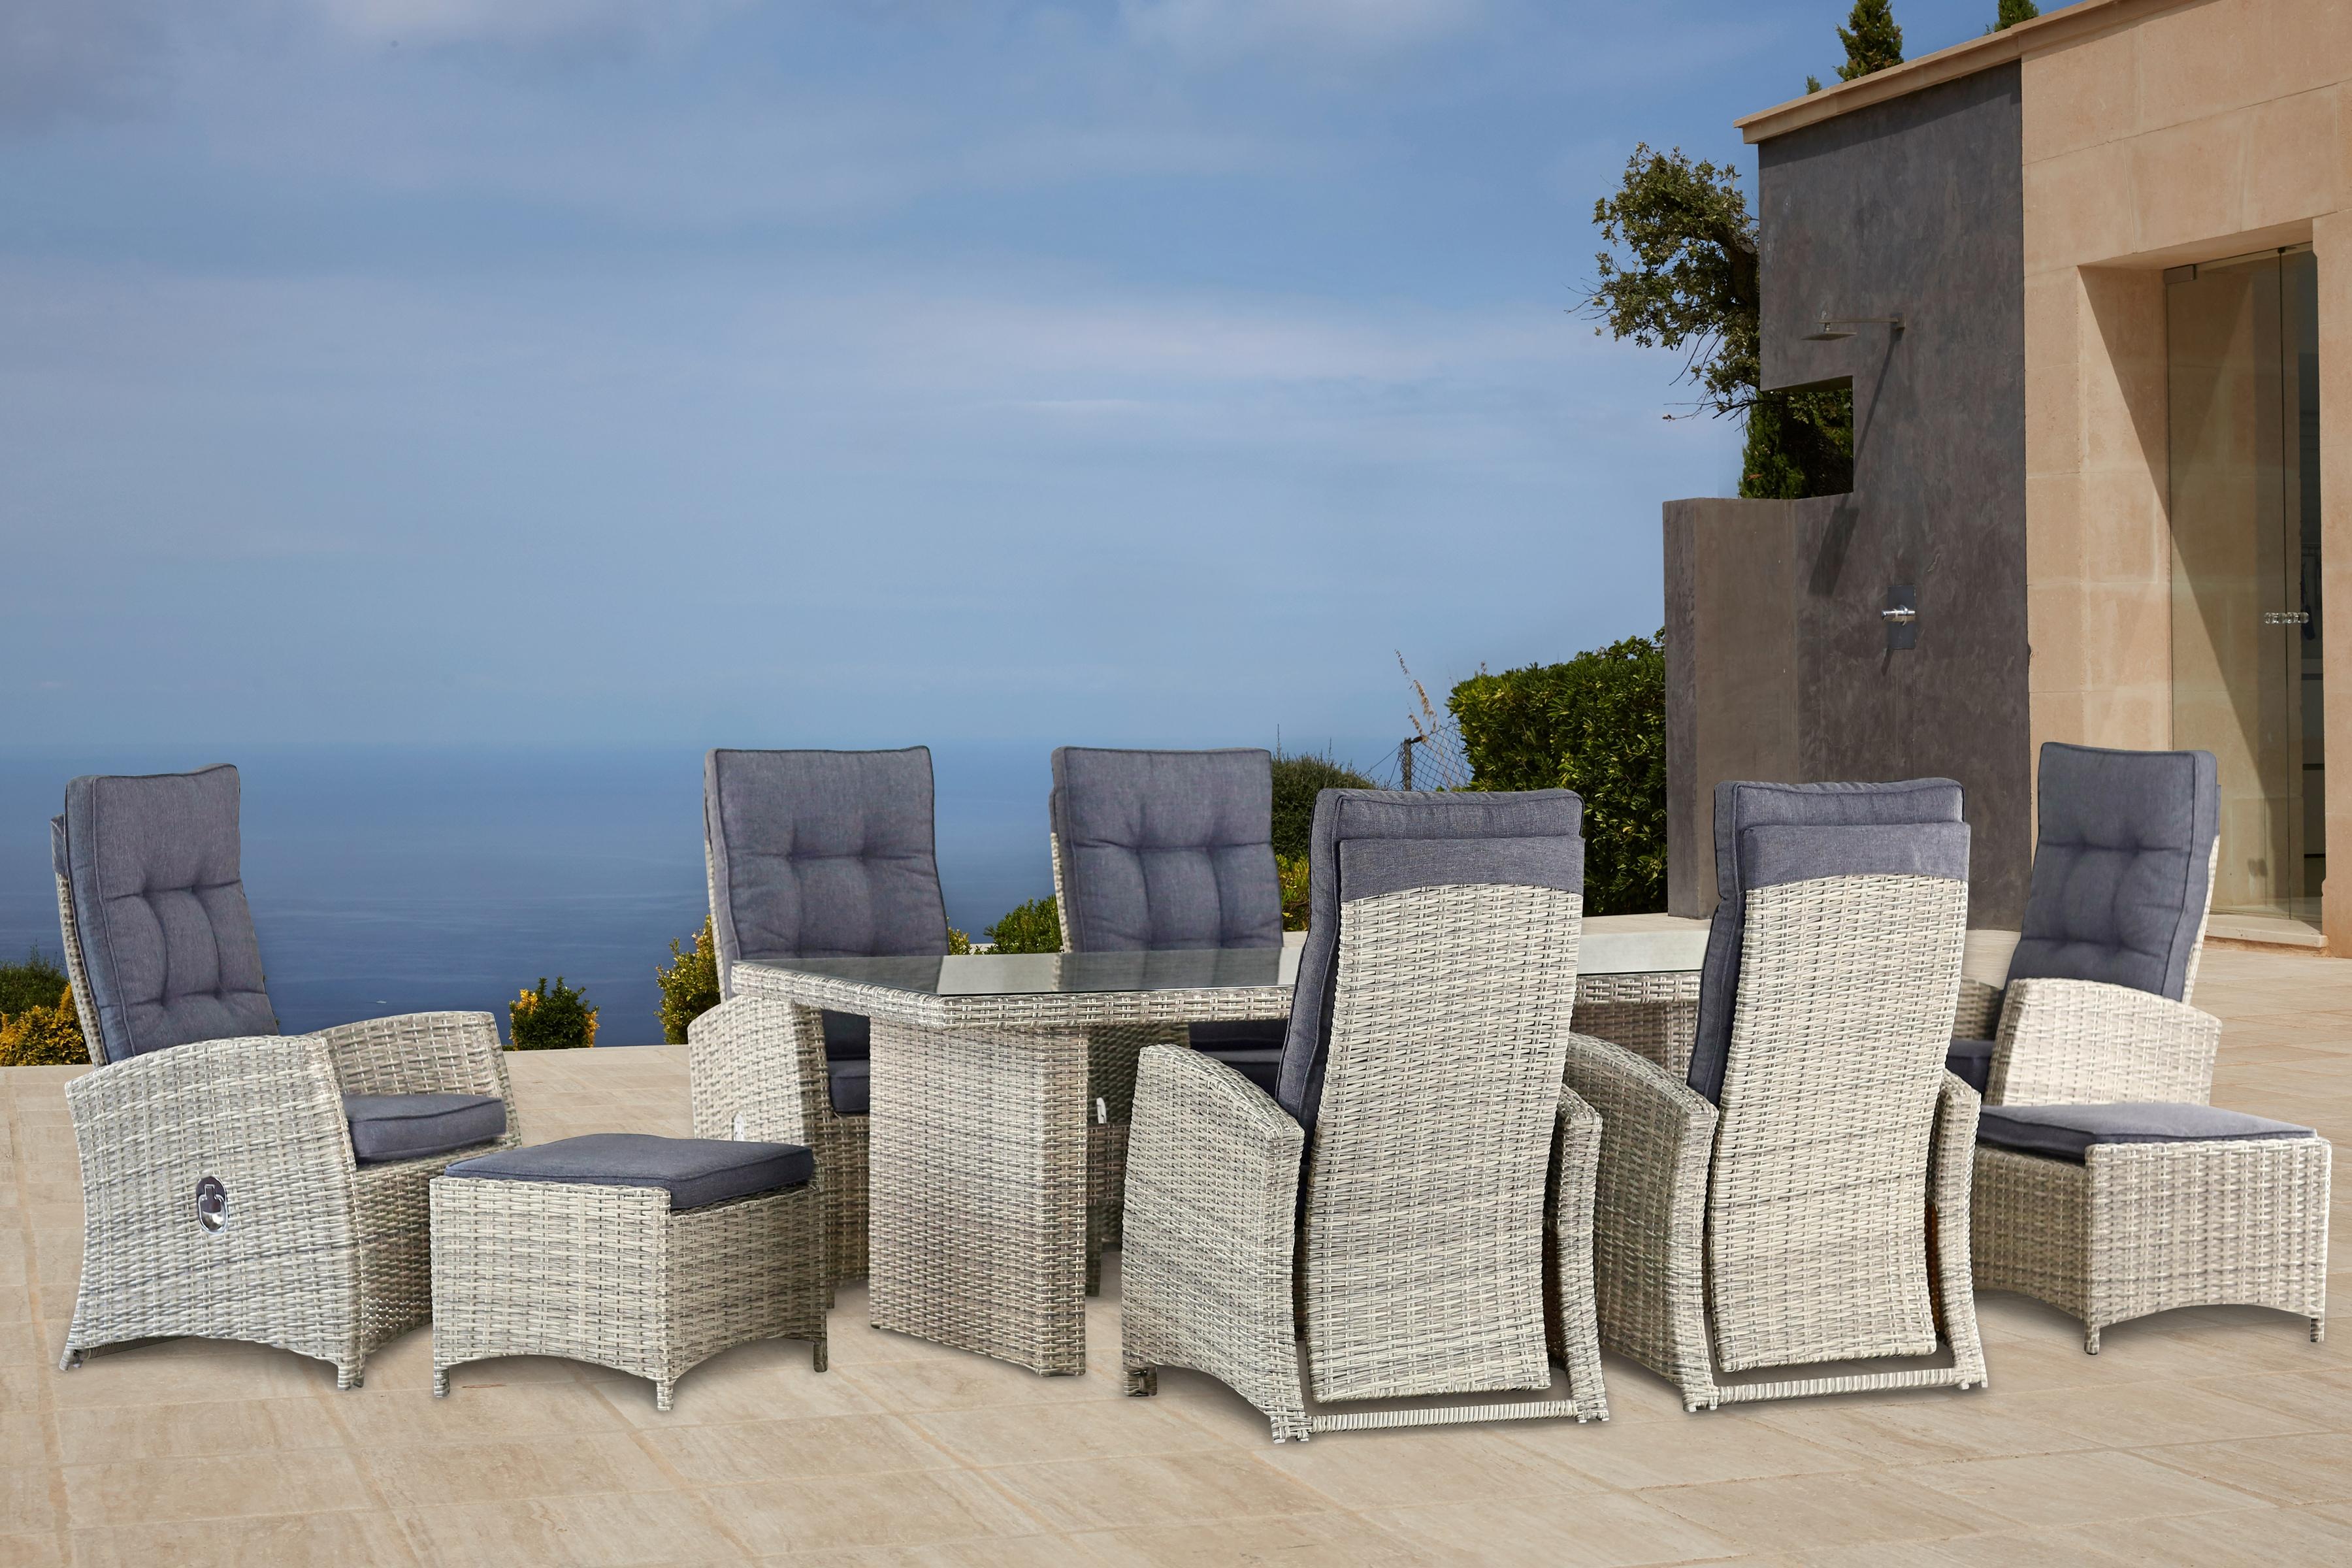 KONIFERA Gartenmöbelset Monaco 17-tlg6 Sessel 2 Hocker Tisch Polyrattan